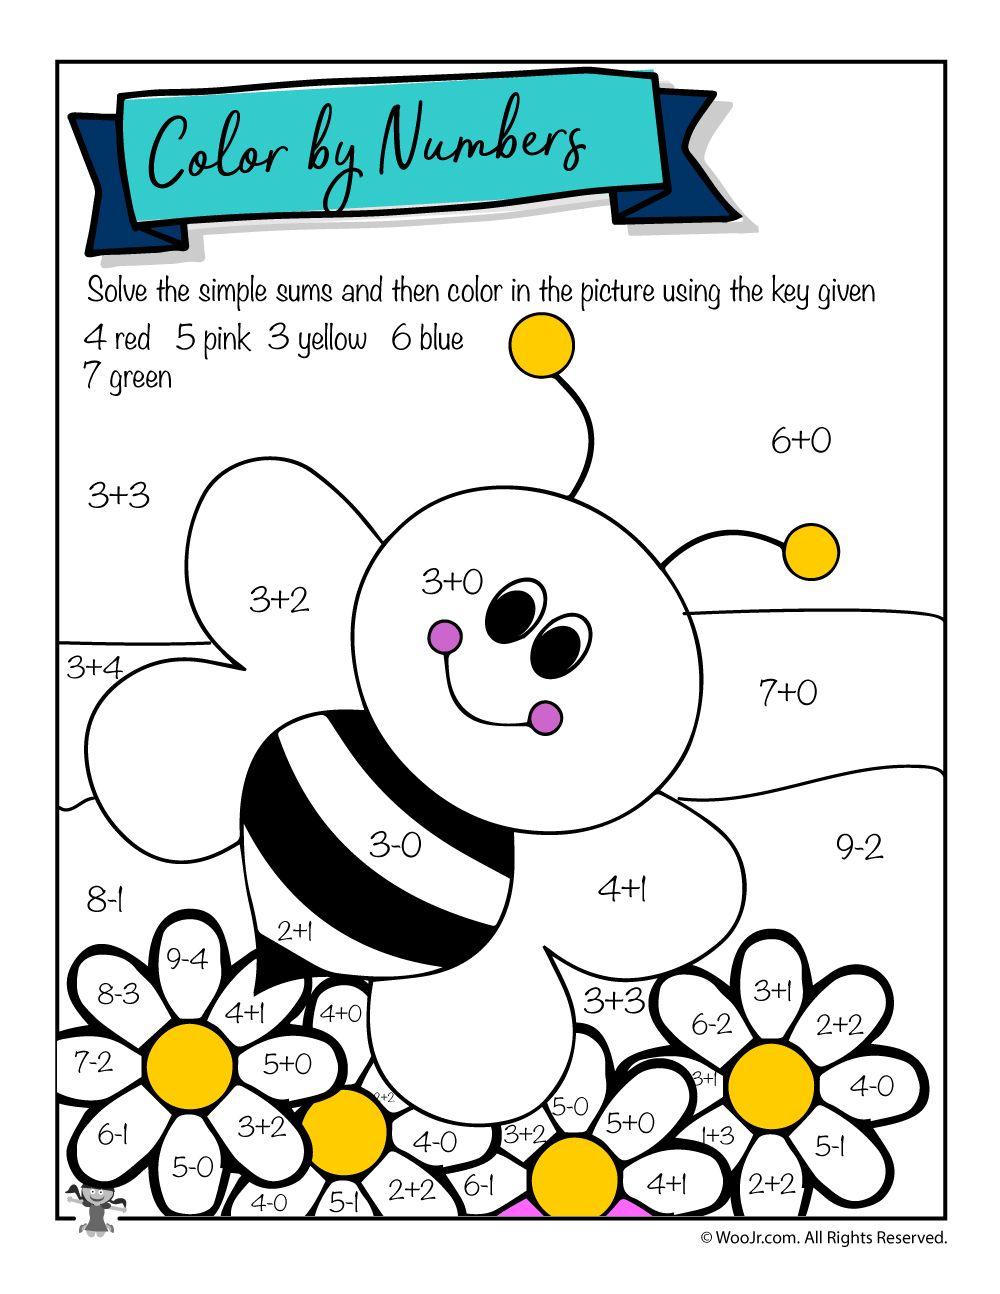 Single Digit Math Coloring Worksheet Woo Jr Kids Activities Math Coloring Spring Math Worksheets Math Coloring Worksheets [ 1294 x 1000 Pixel ]